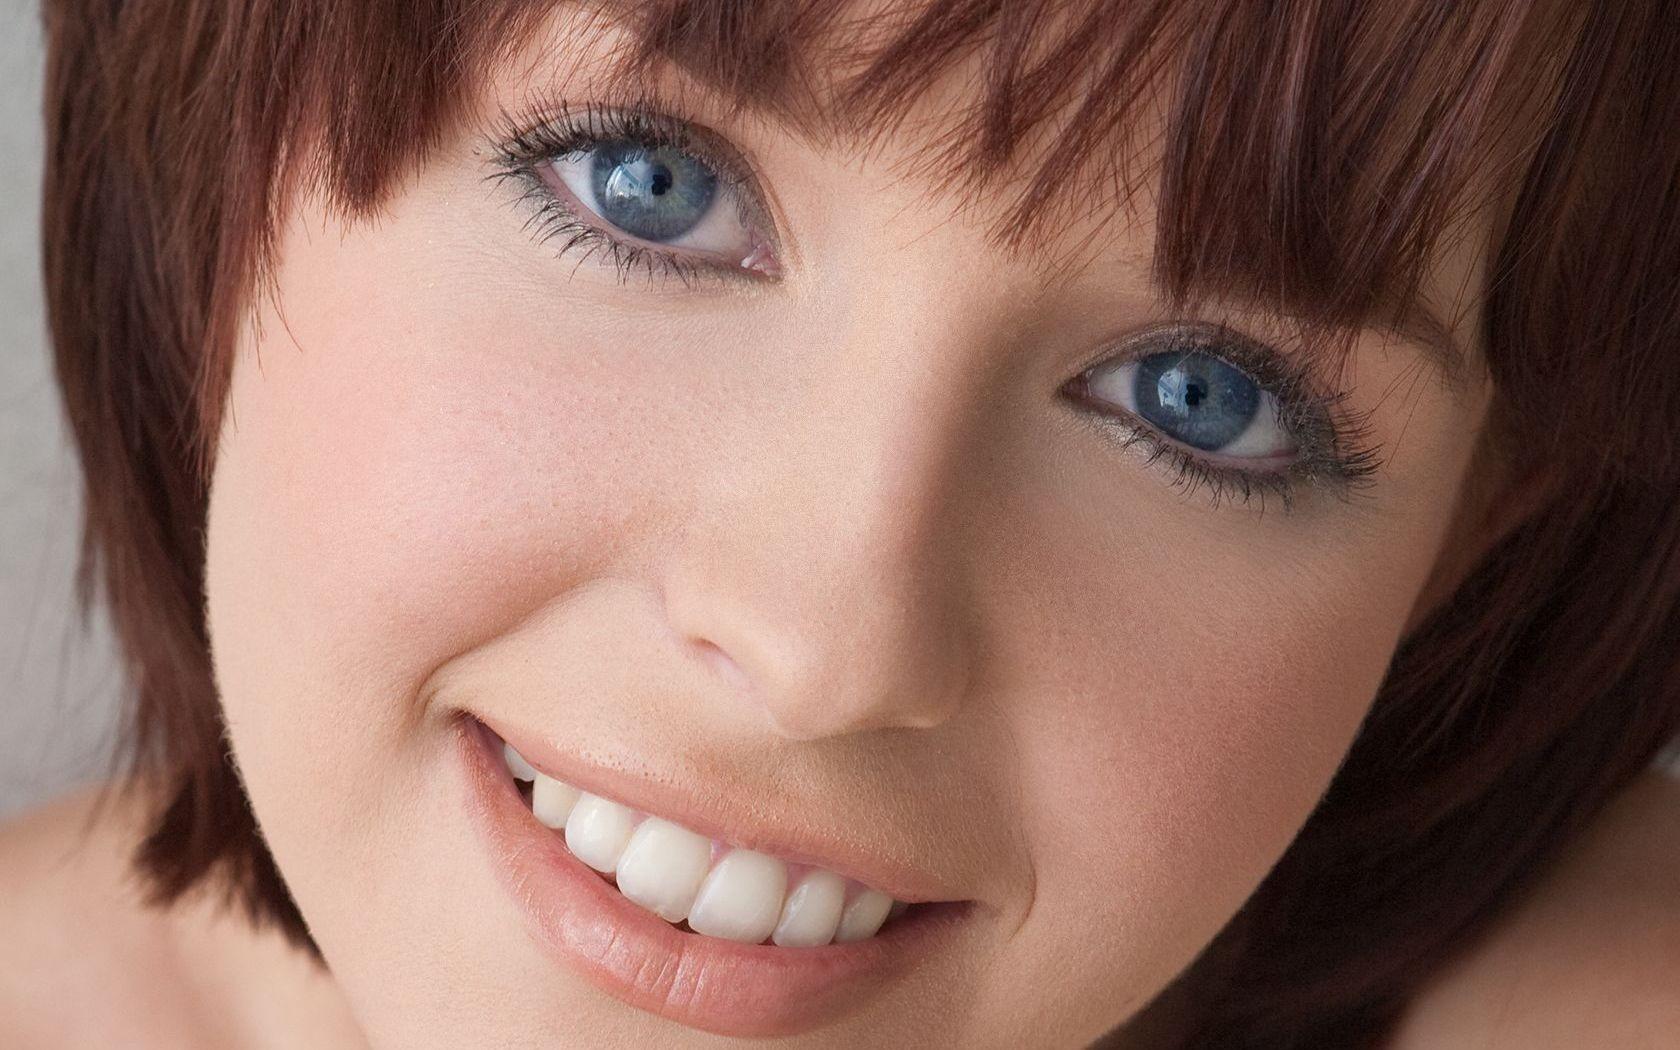 Glasses Pornstar Open Mouth Looking At Viewer Closeup Smiling Black Hair Bangs Teeth Nose Emotion Skin Head Hayden Winters Girl Beauty